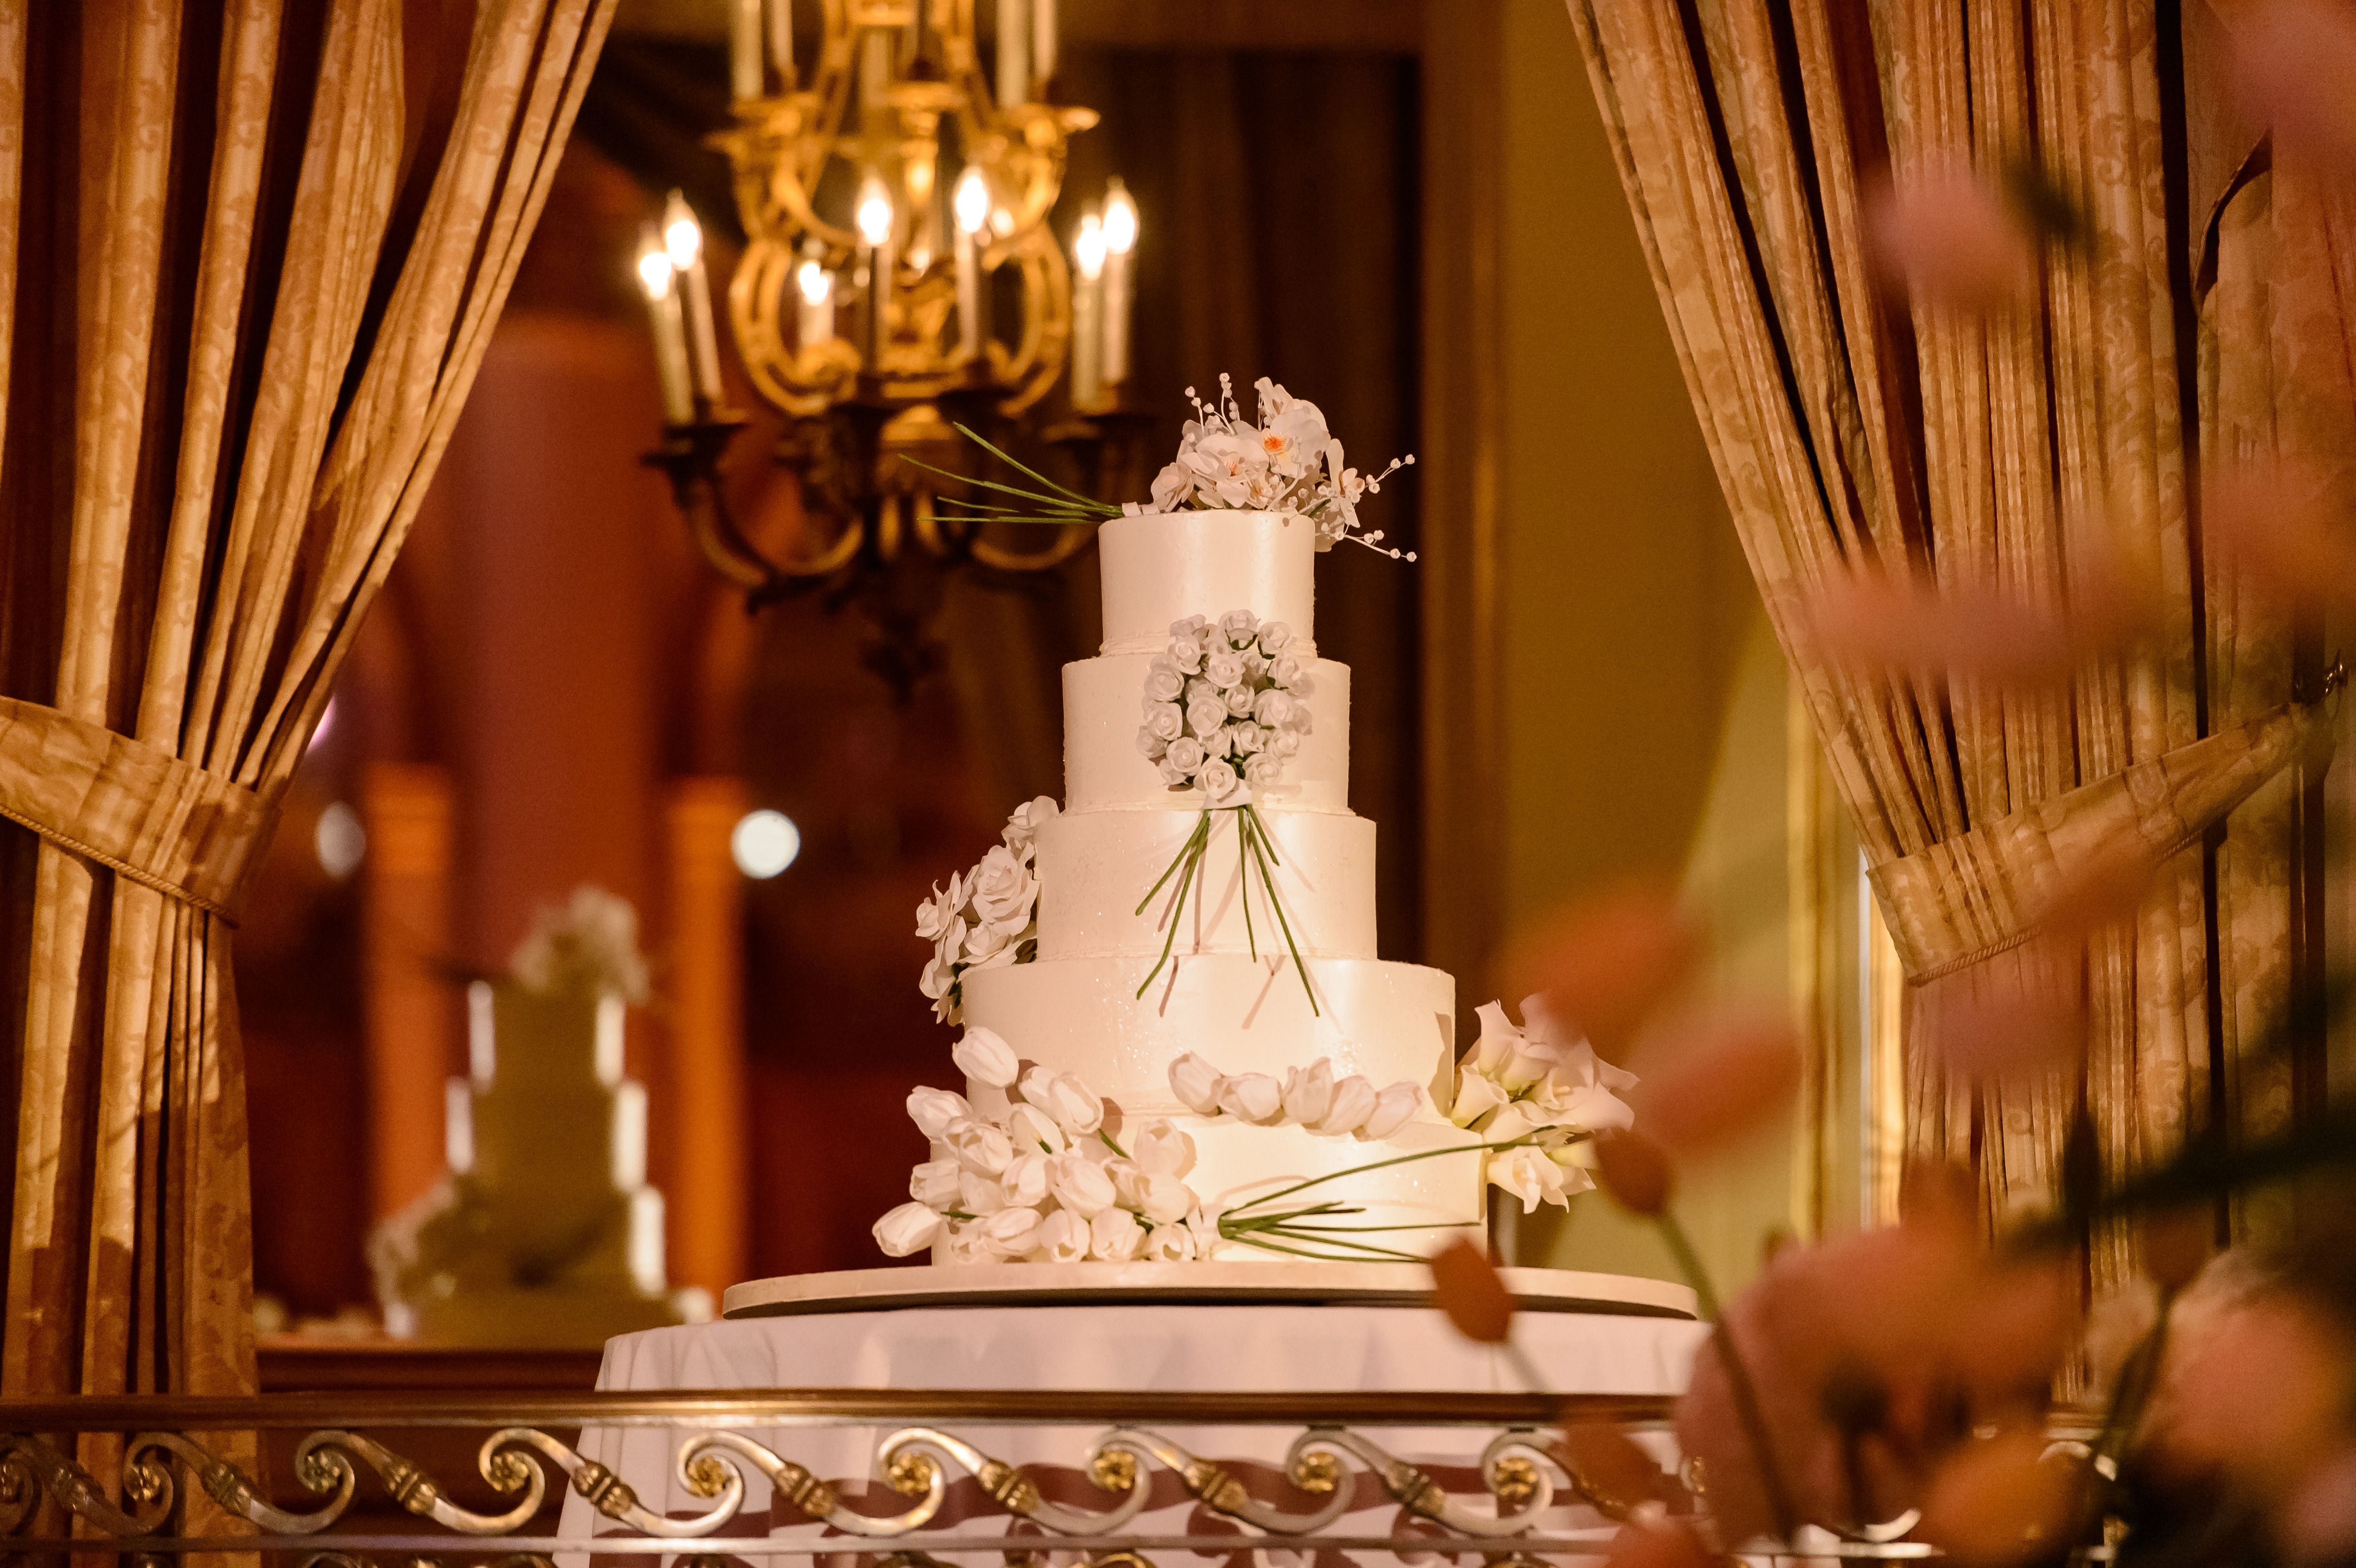 The cake design rosana u brianus spectacular wedding at the plaza